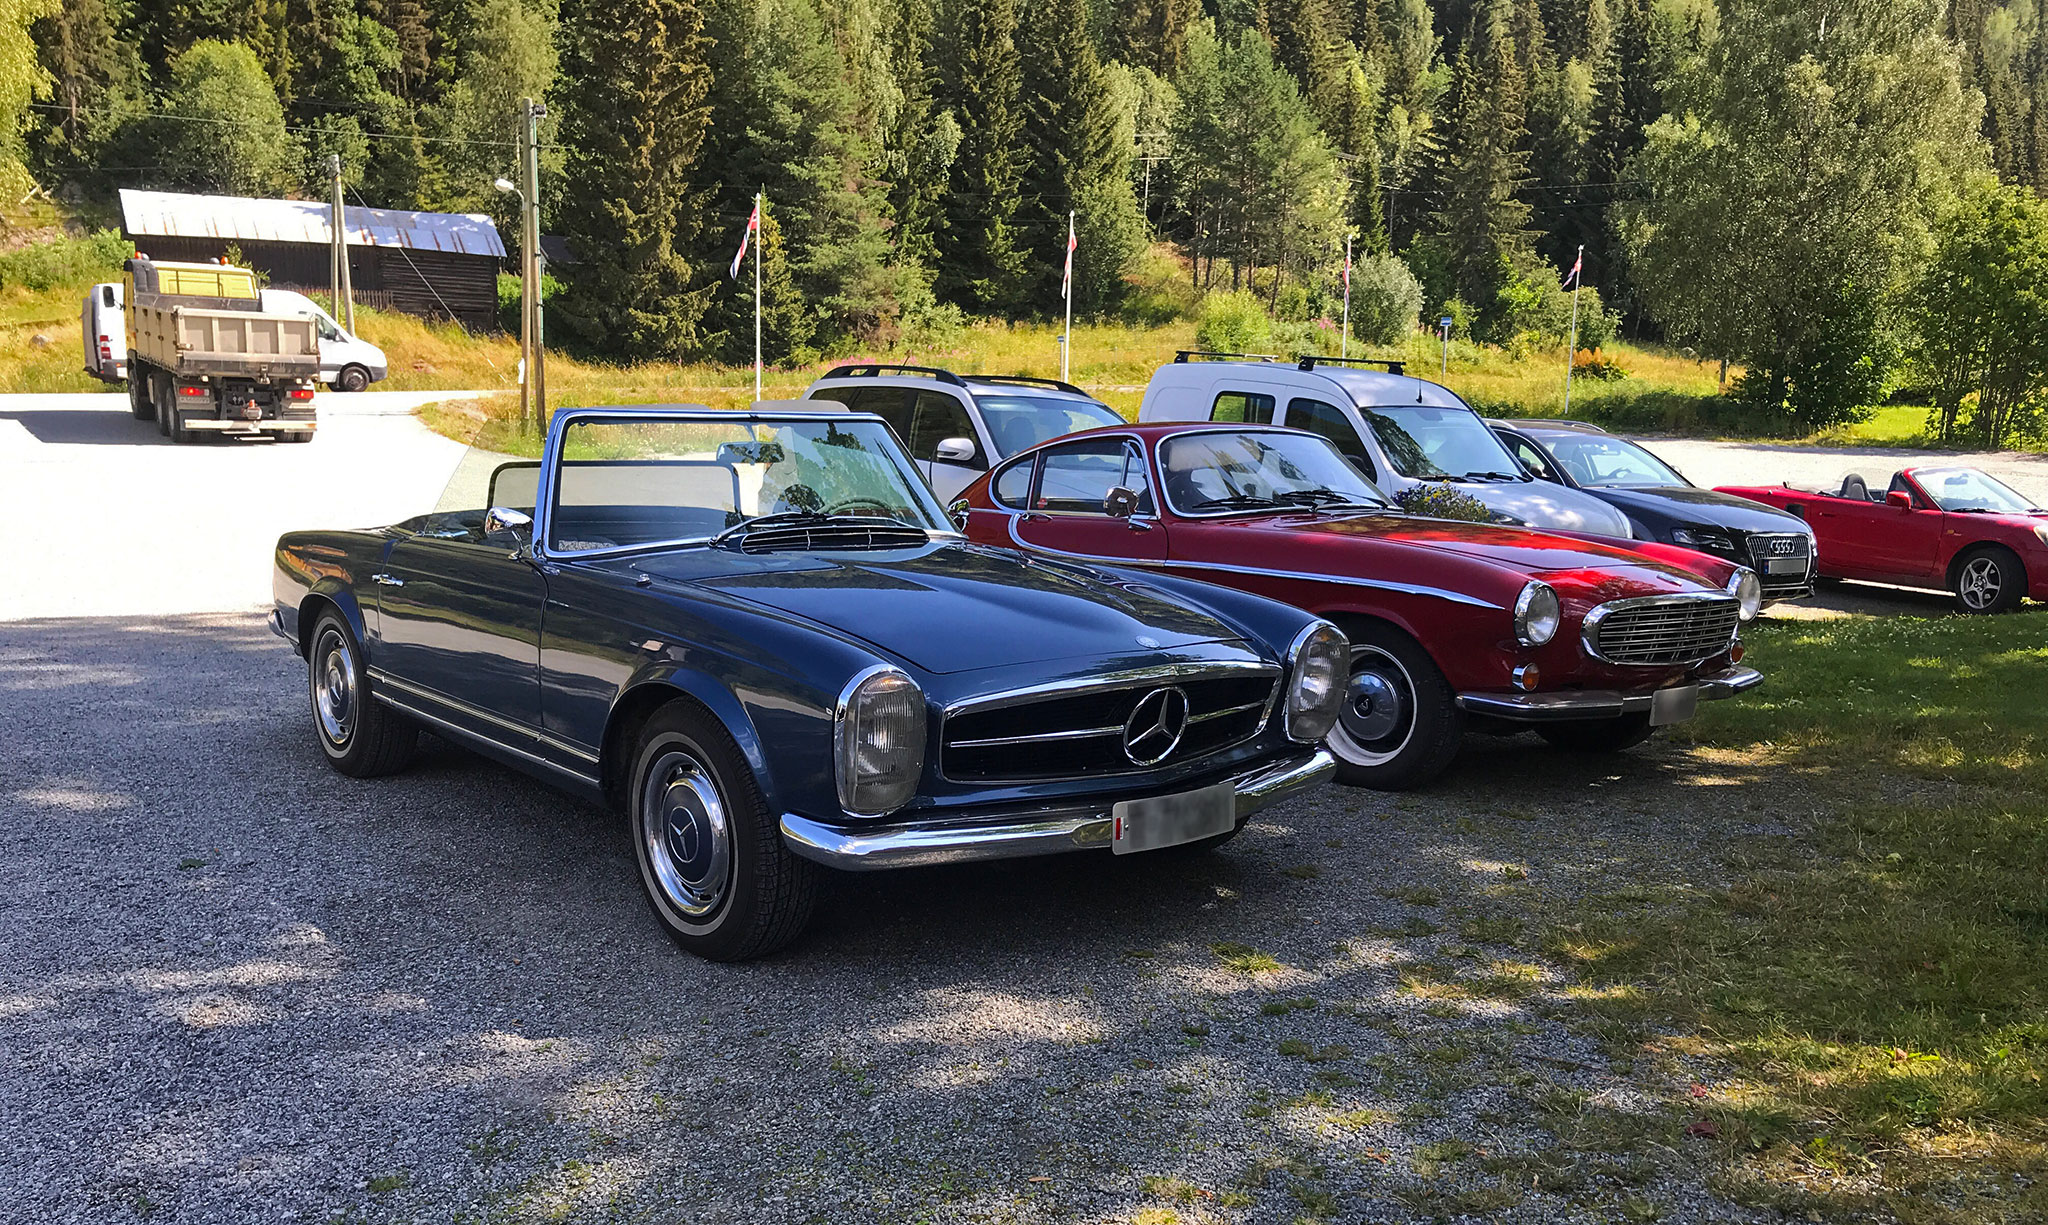 Fine old automobiles